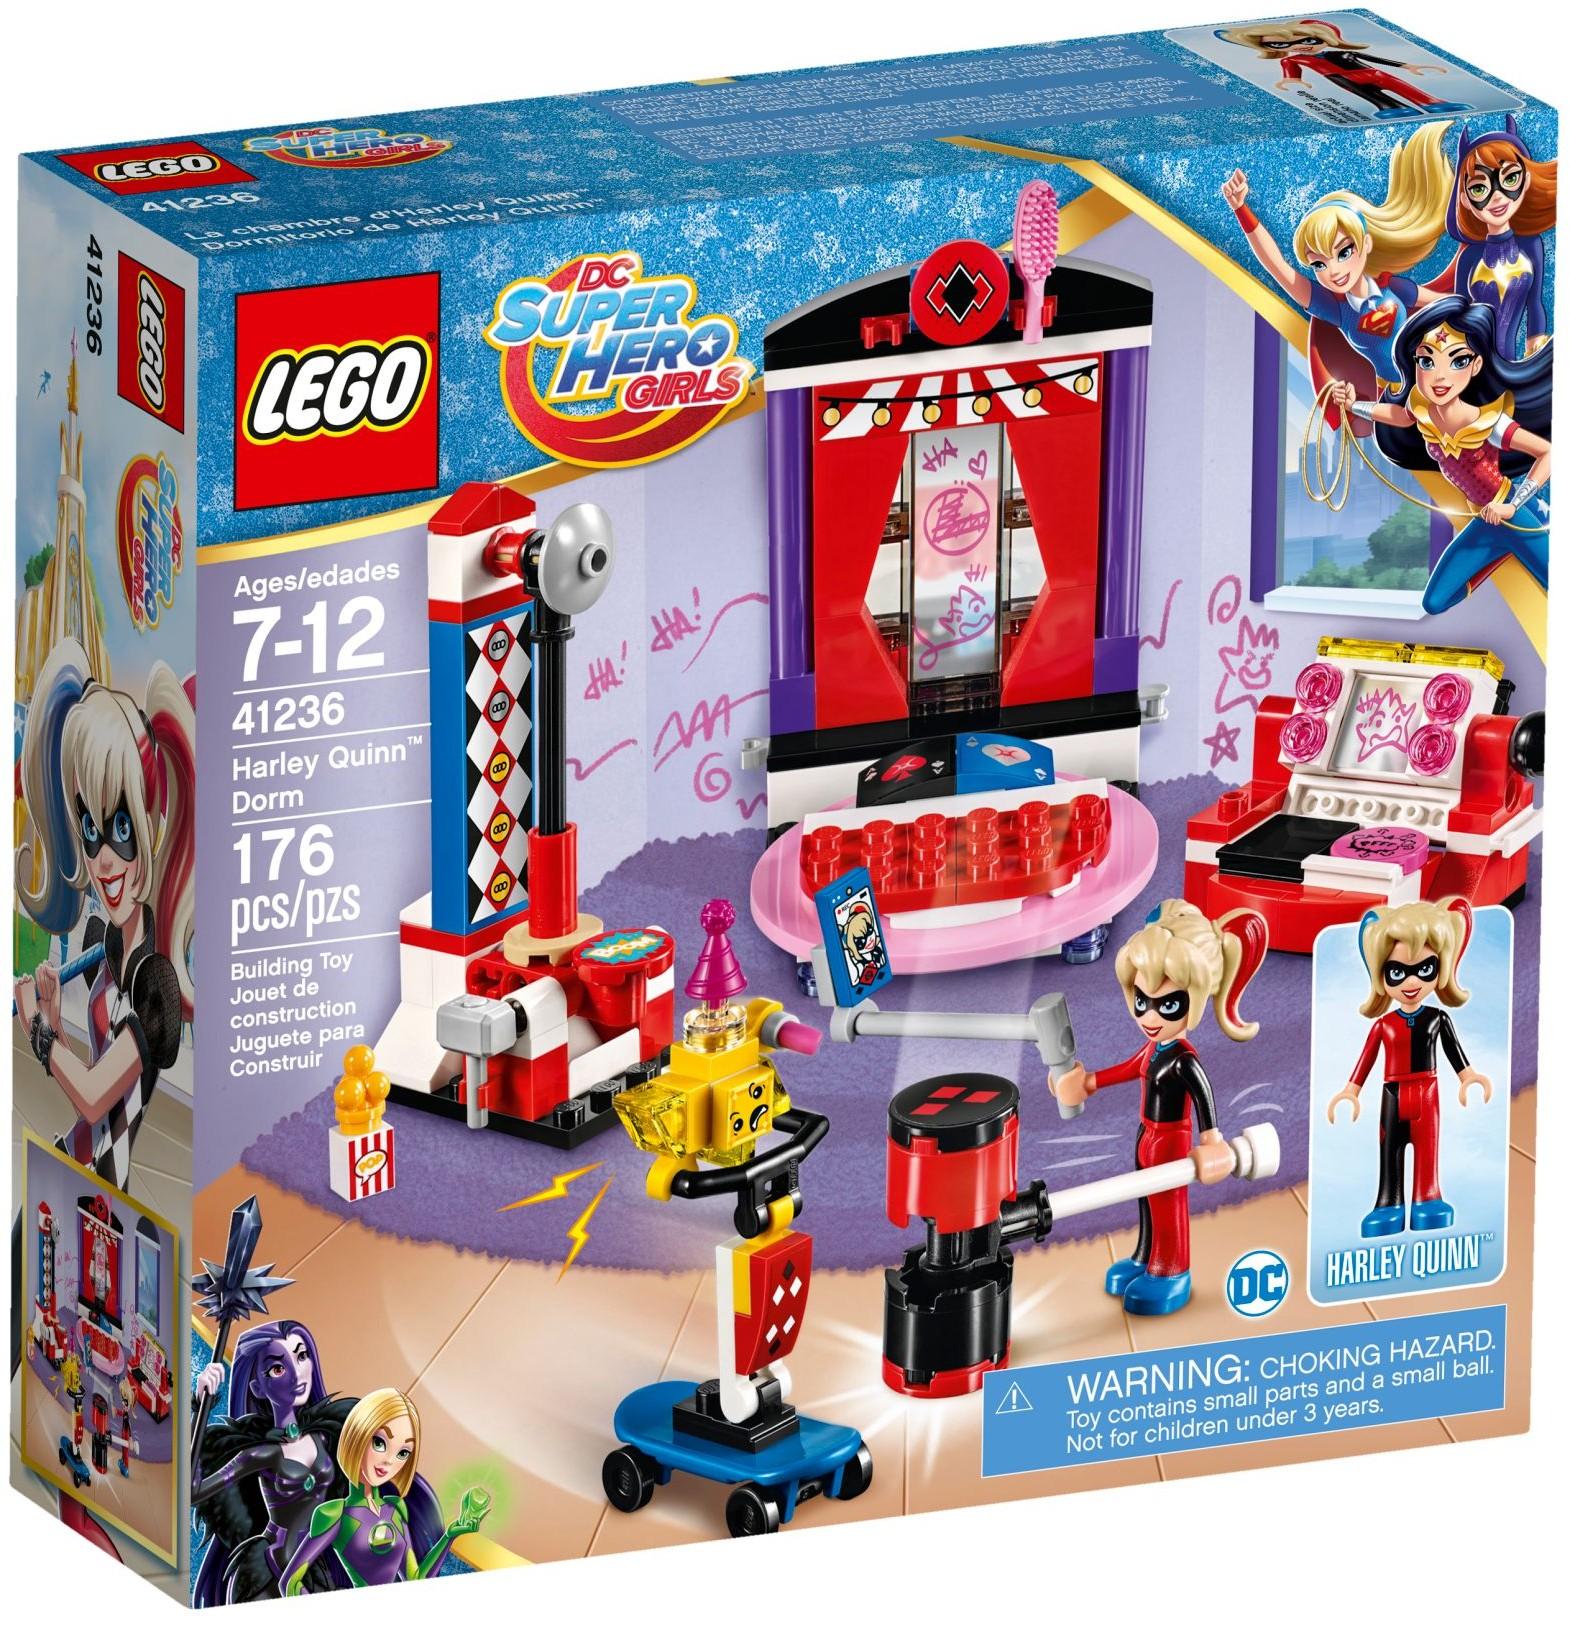 41236 Harley Quinn Dorm